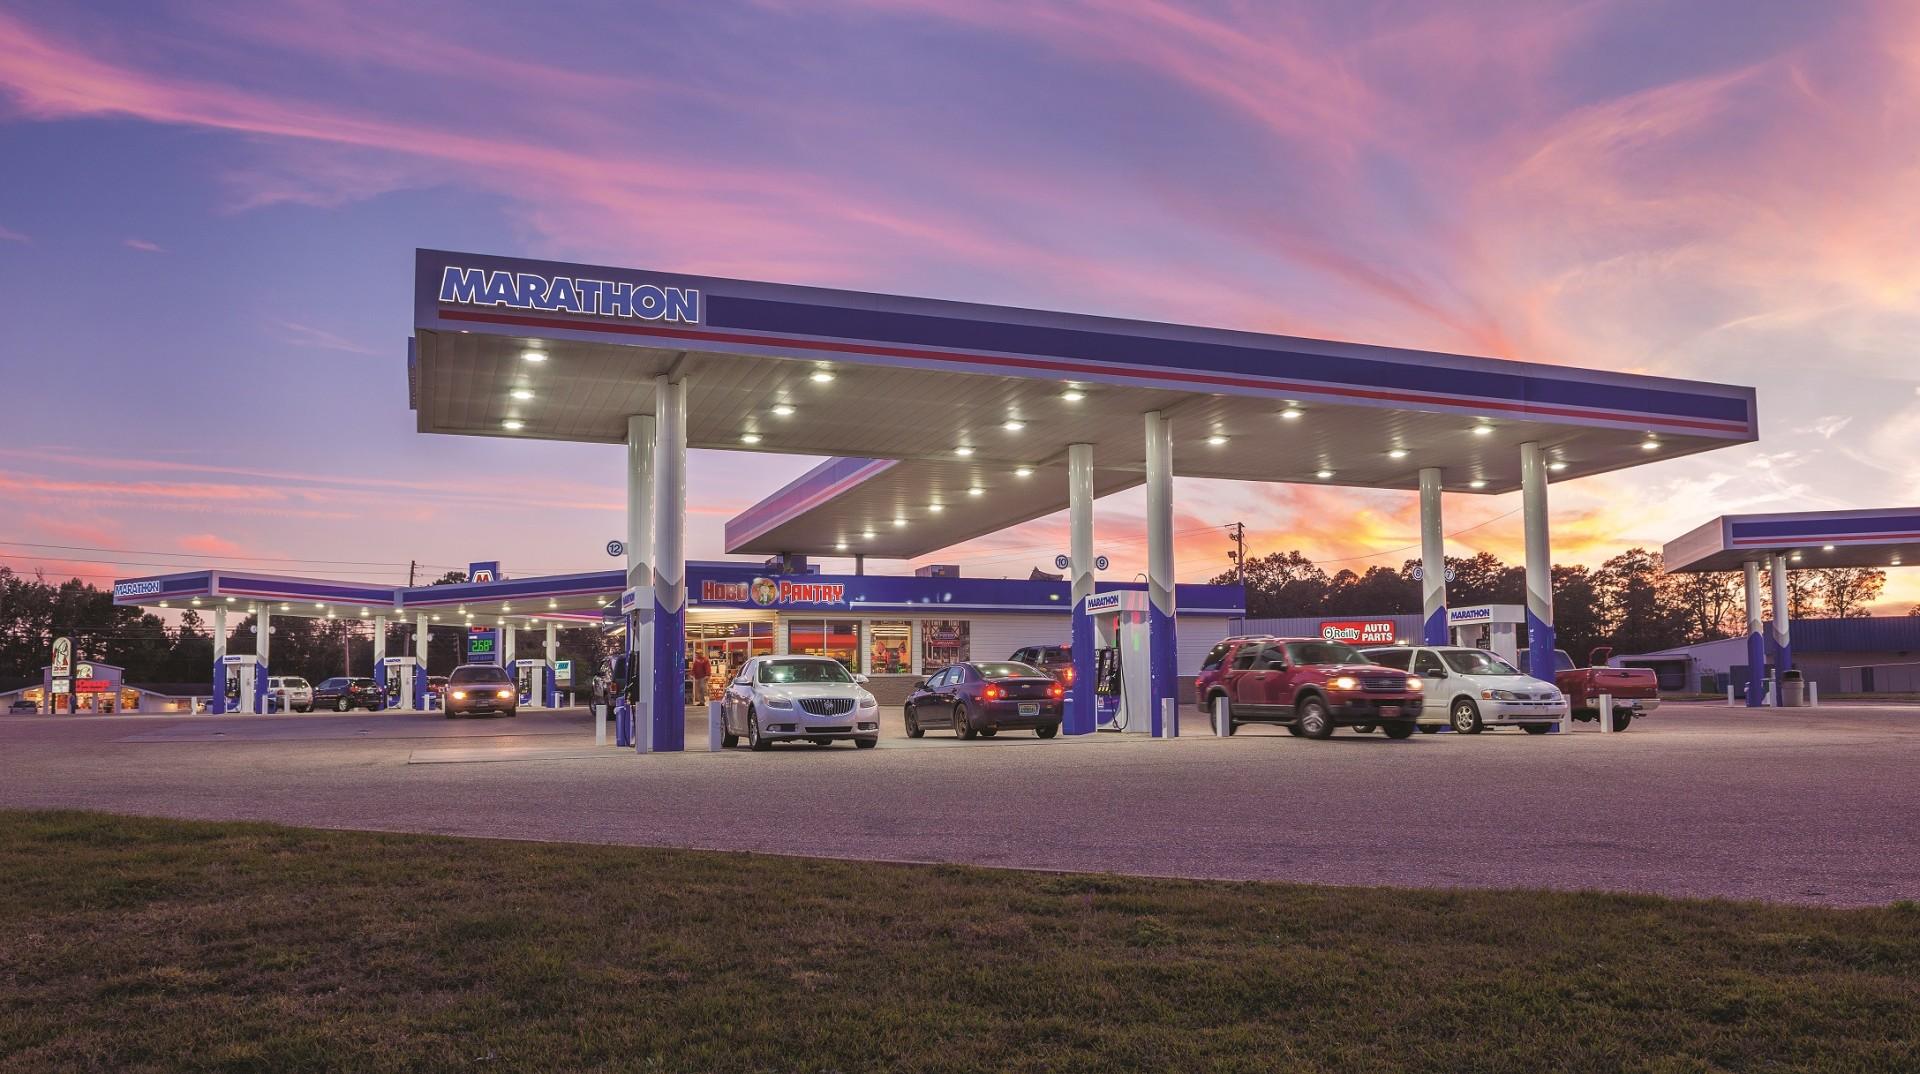 Gas station with Marathon awning near sunset.